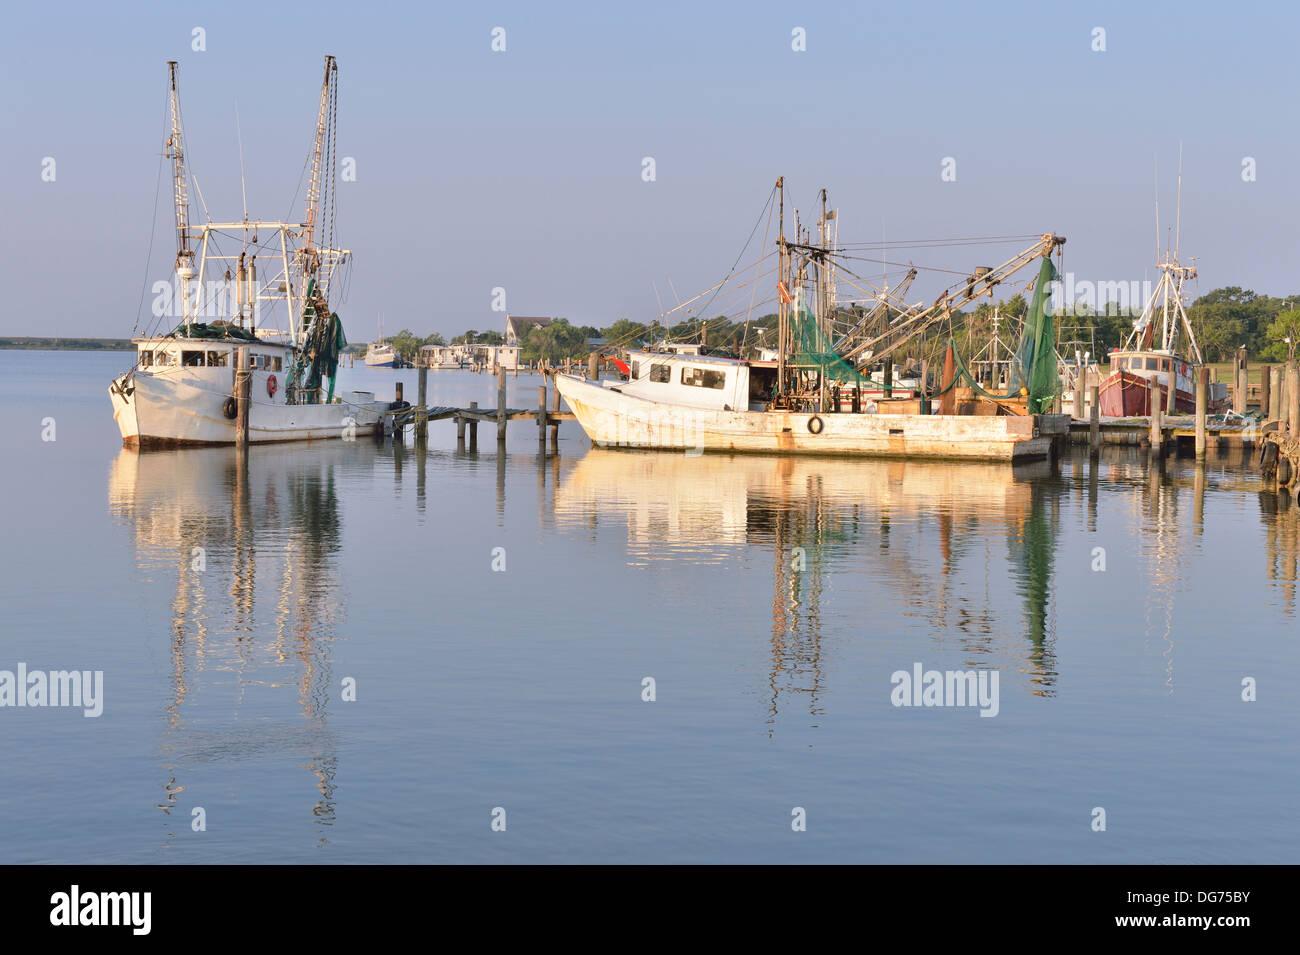 Shrimp boats on the Dickinson Bayou, Texas, USA - Stock Image